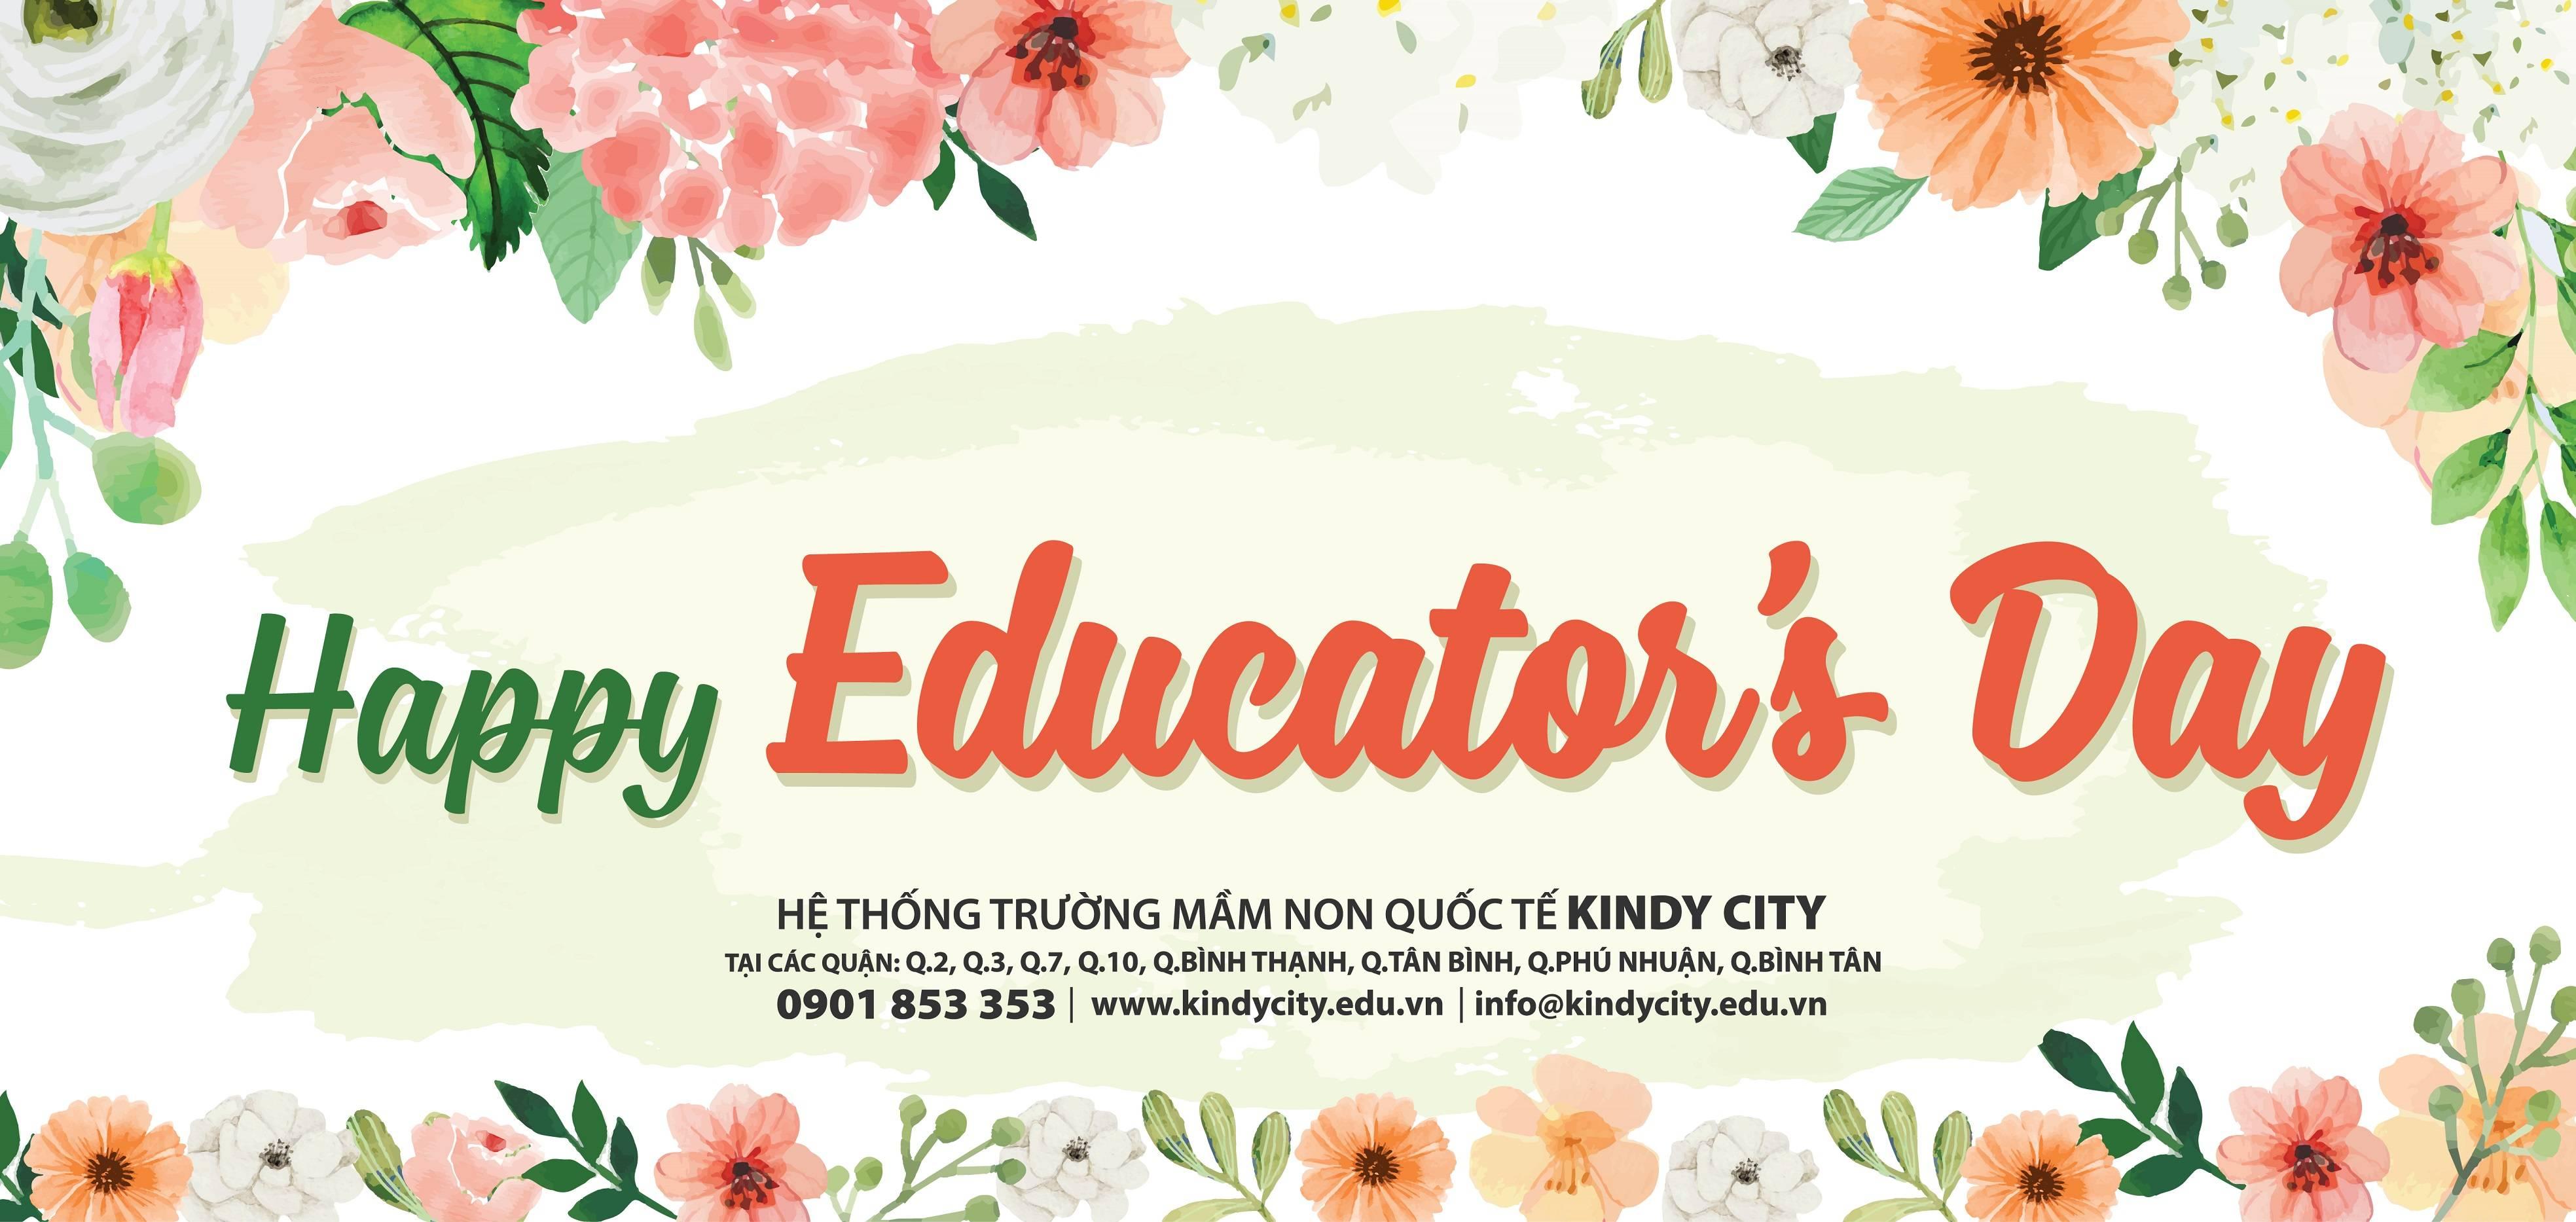 happy-educatorso-day